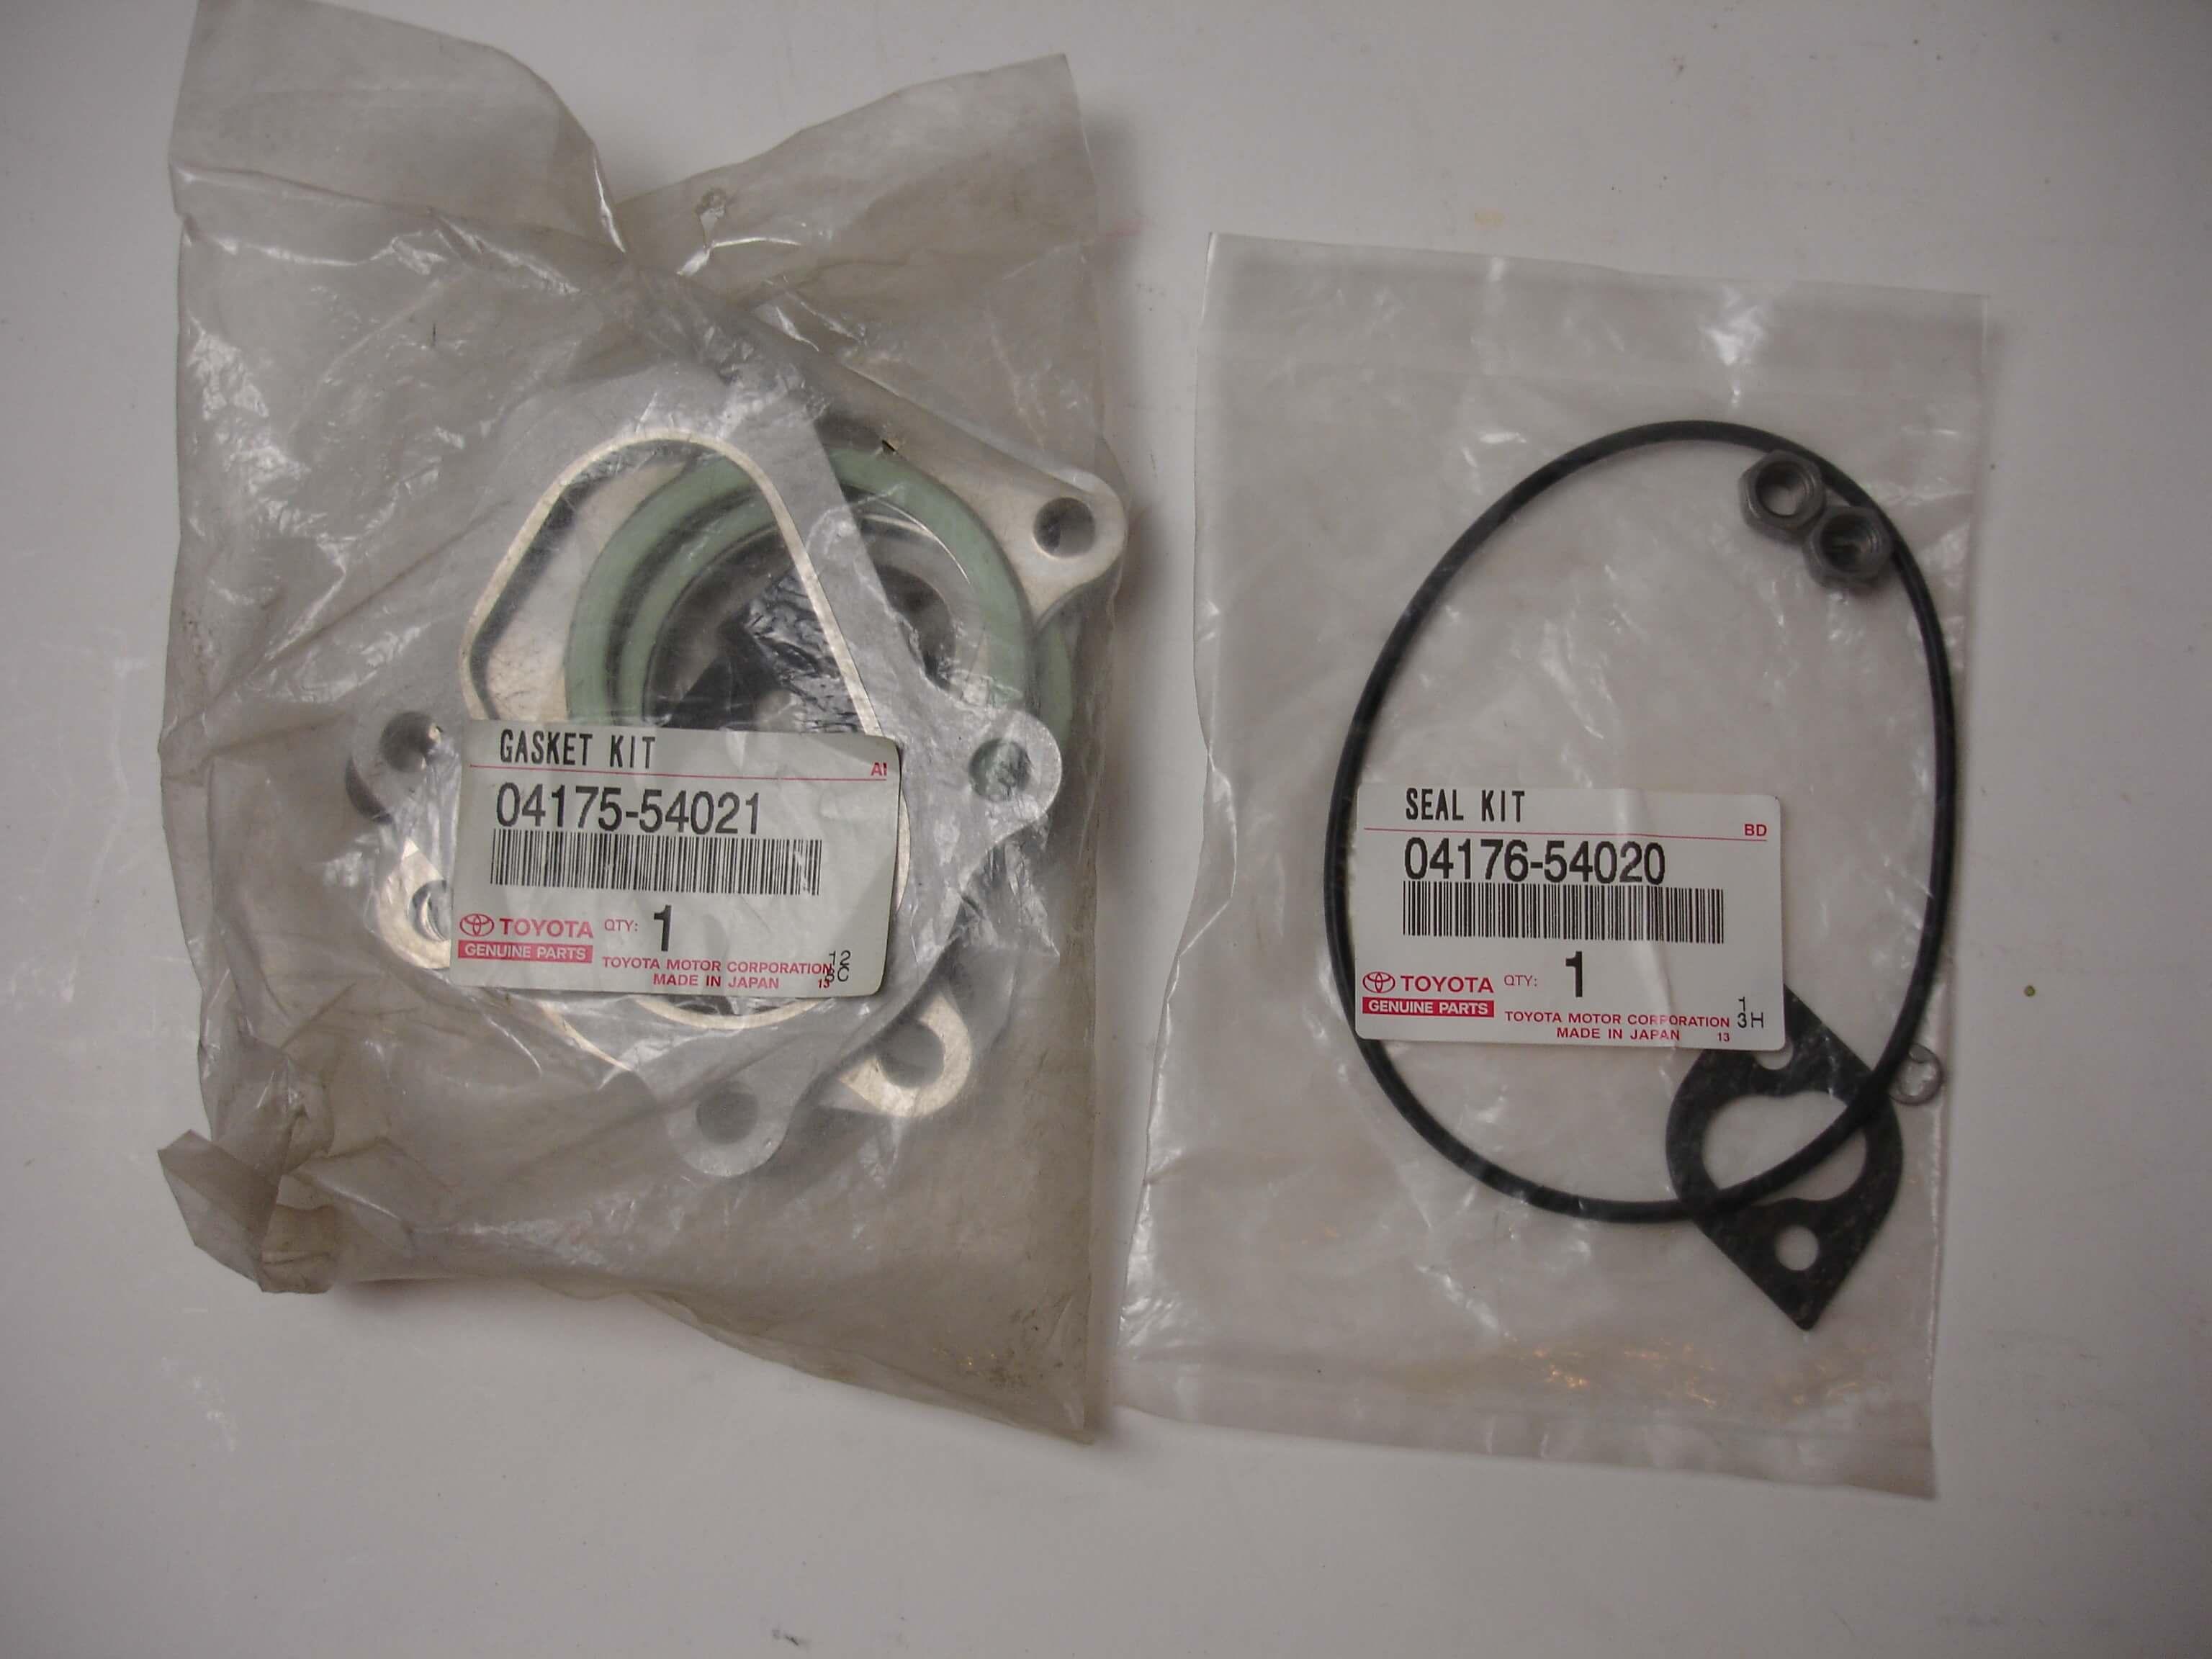 Toyota OEM 2LT-E Turbocharger Gasket Kit And Seal Kit 04175-54021 04176-54020